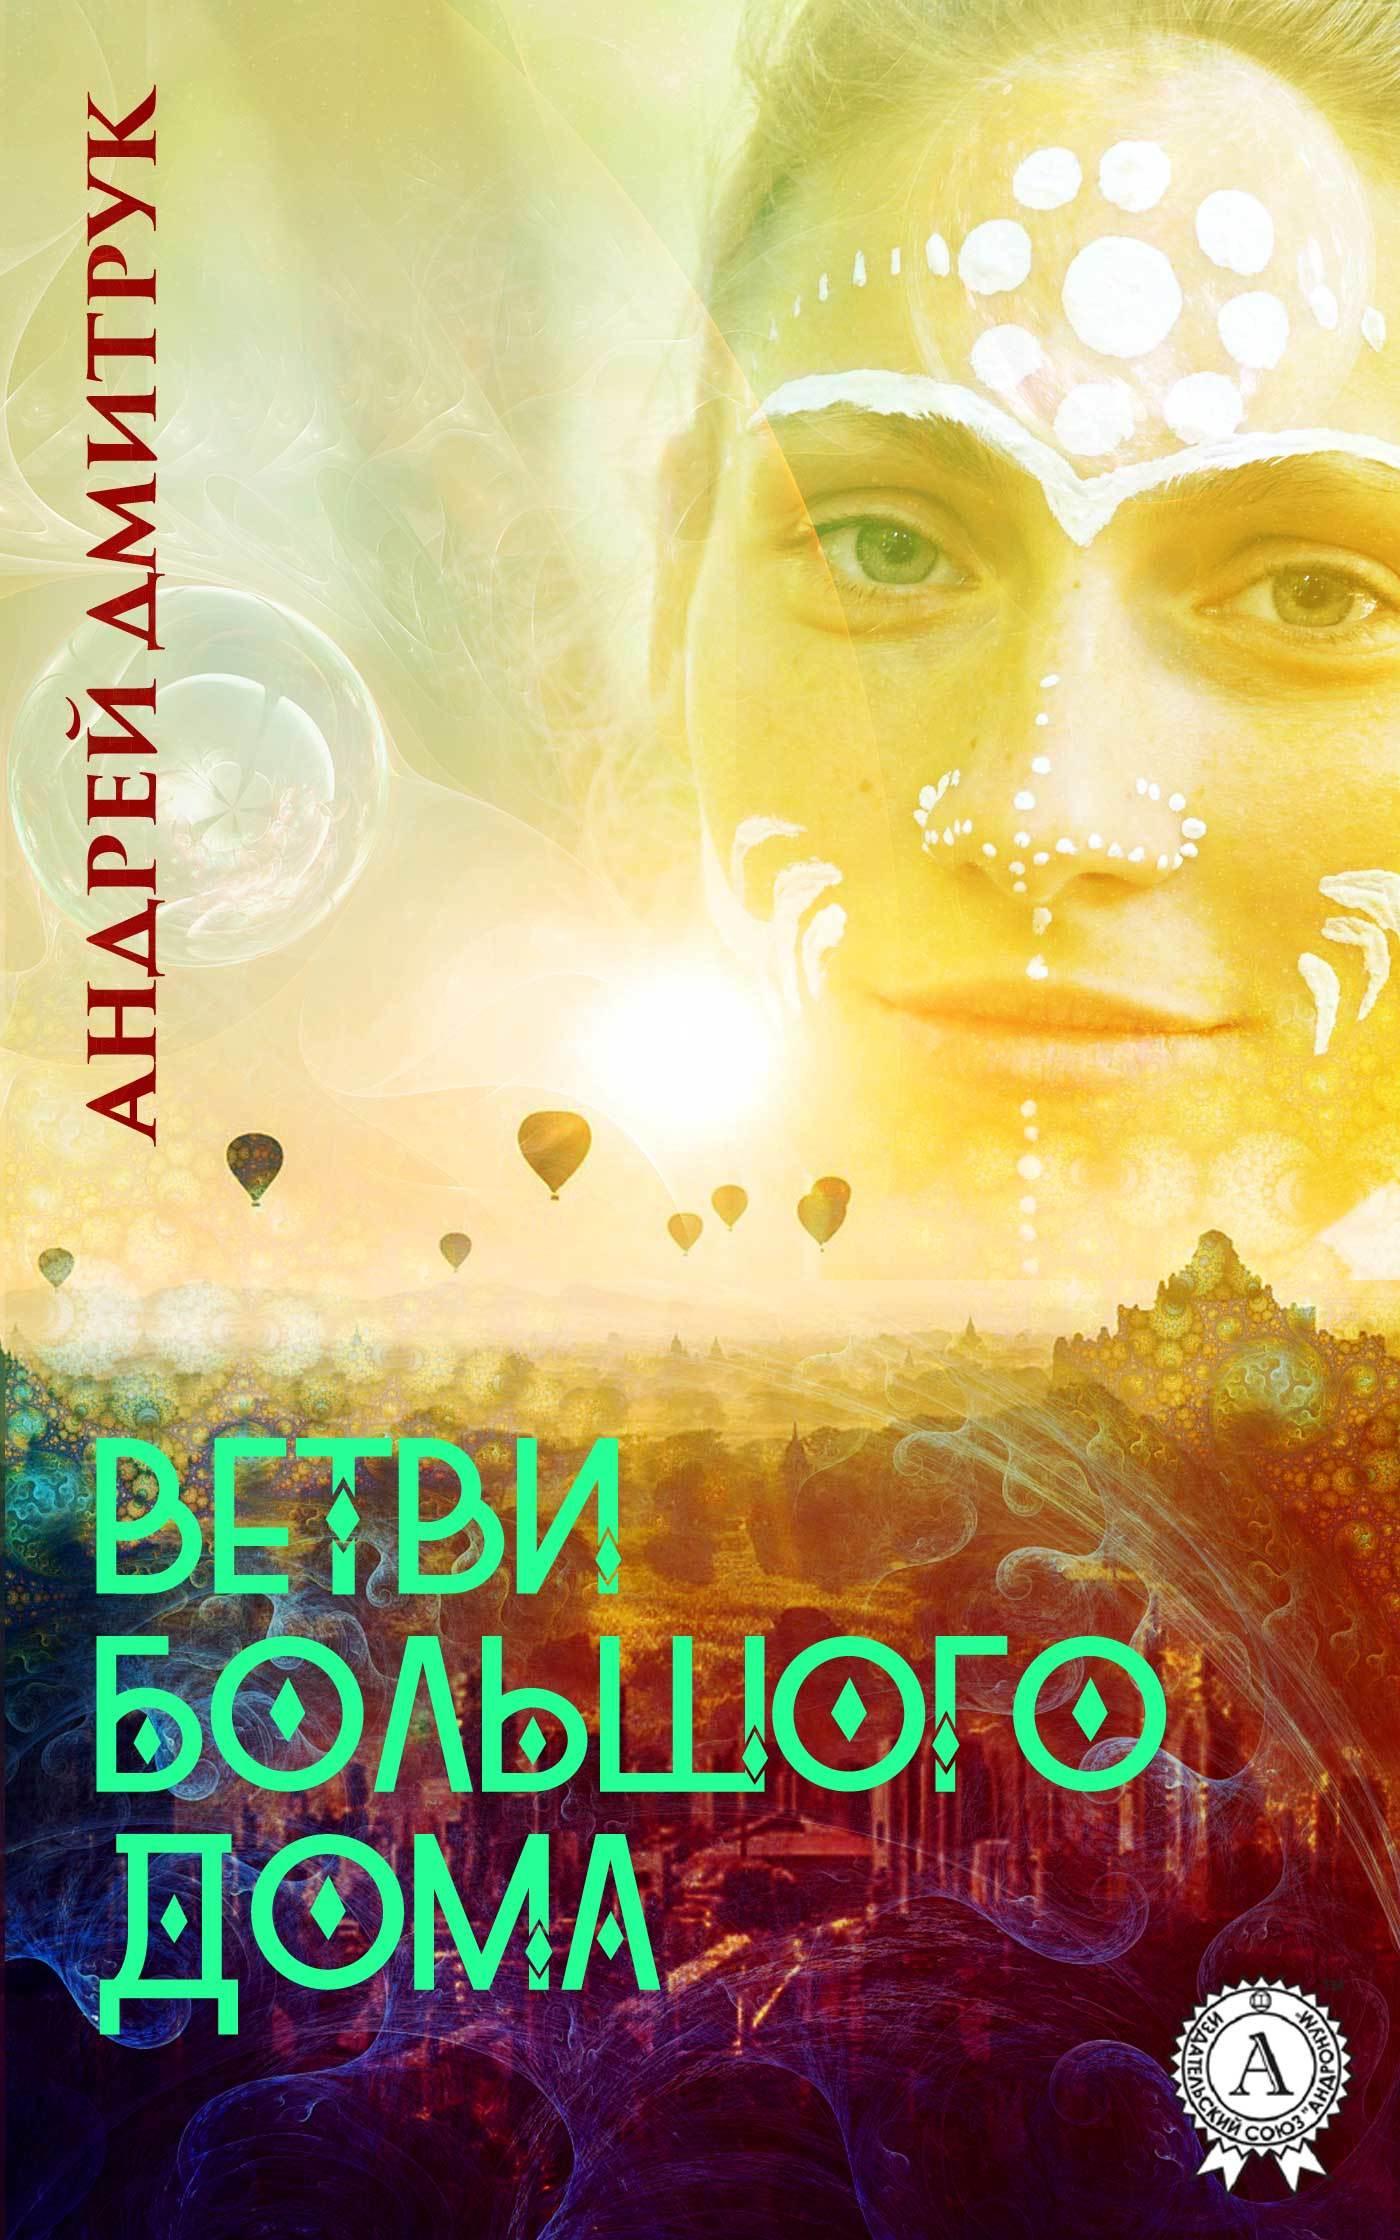 обложка книги static/bookimages/21/54/15/21541550.bin.dir/21541550.cover.jpg